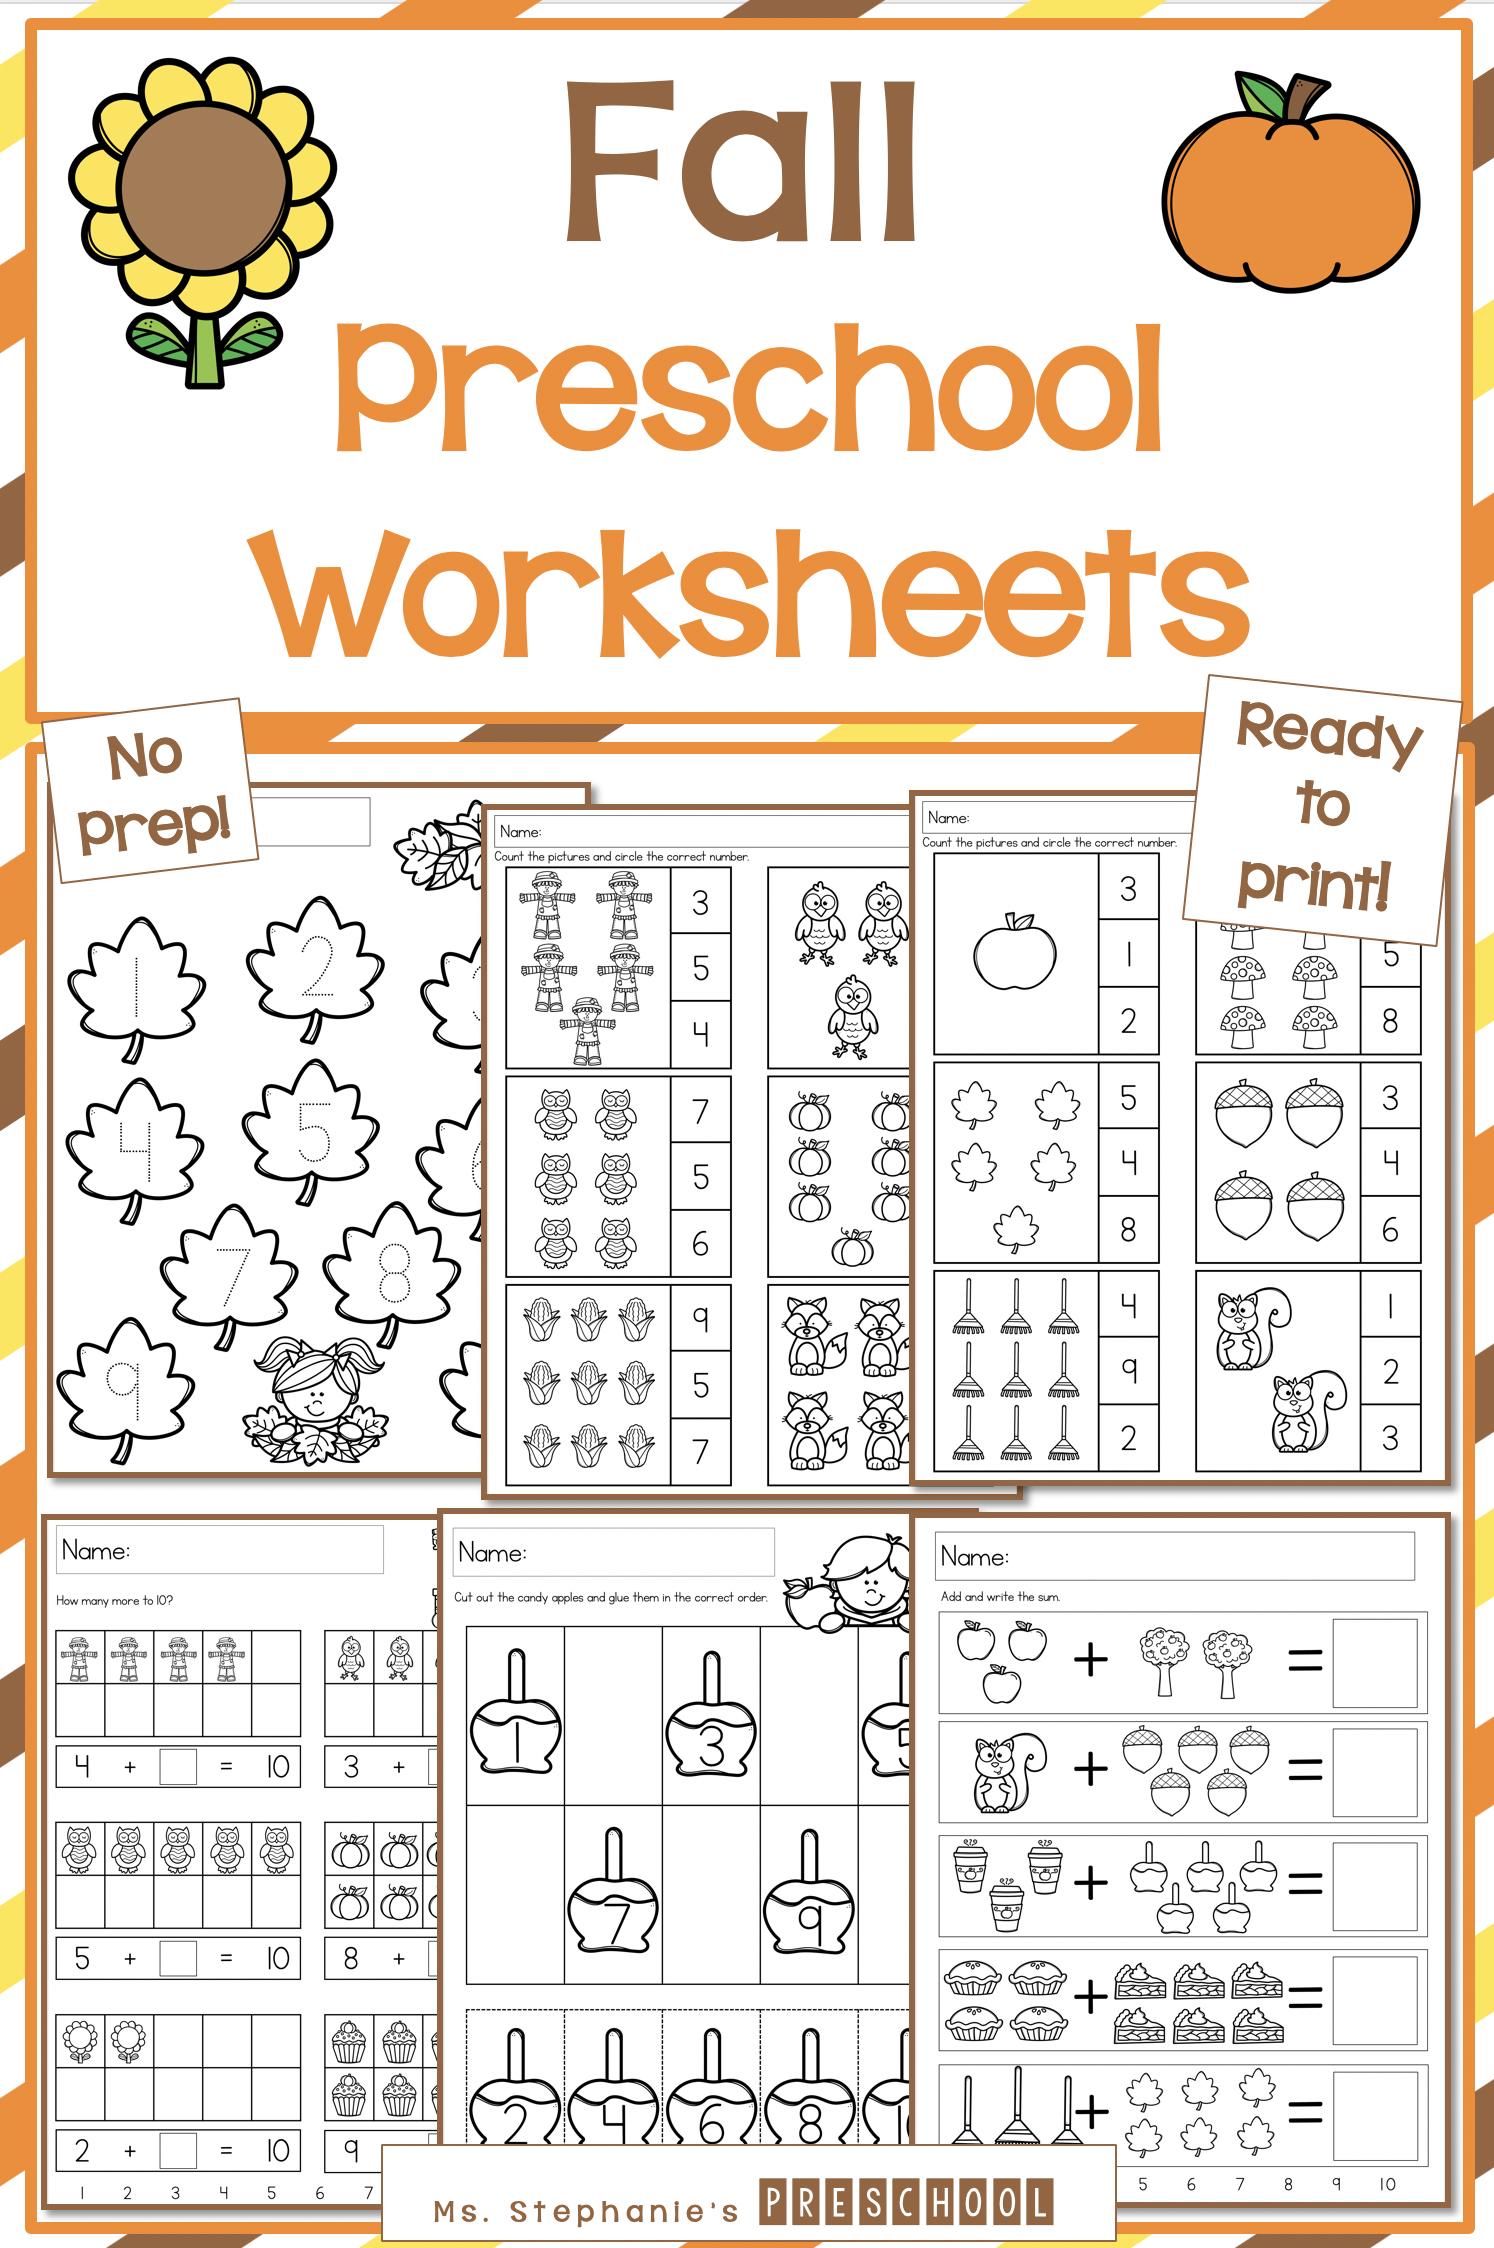 Fall Preschool Worksheets In